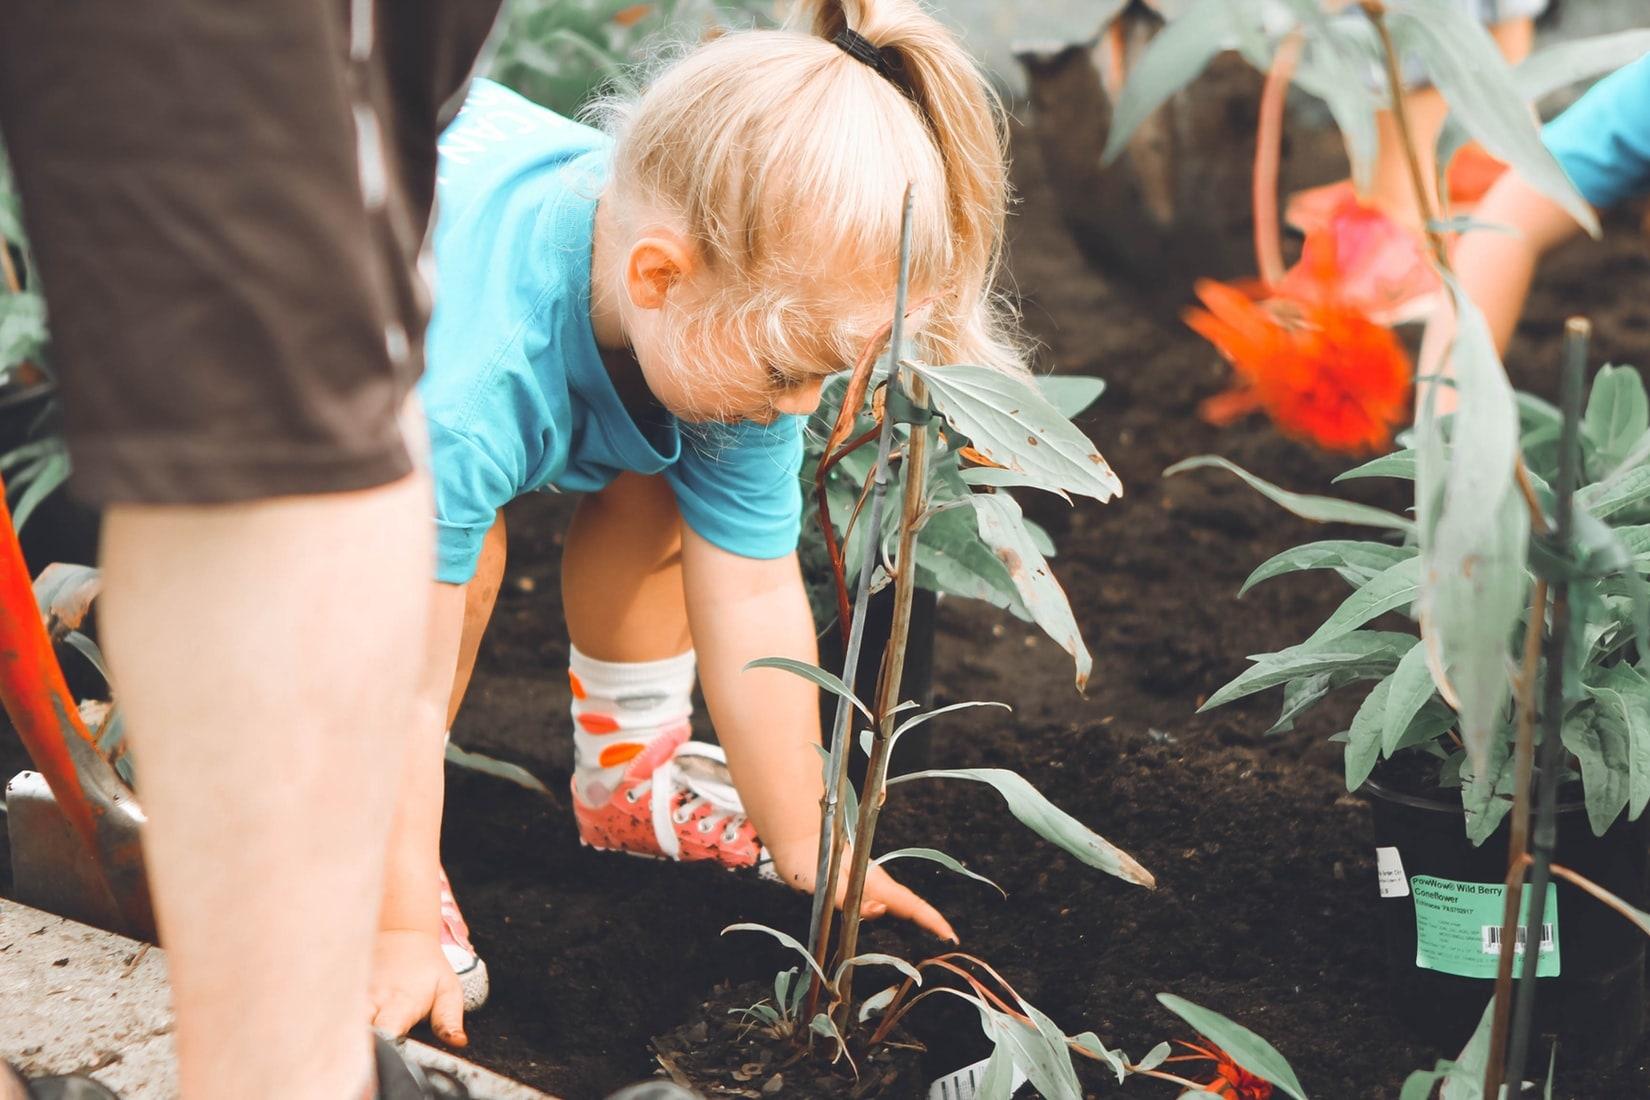 girl gardening planting flowers